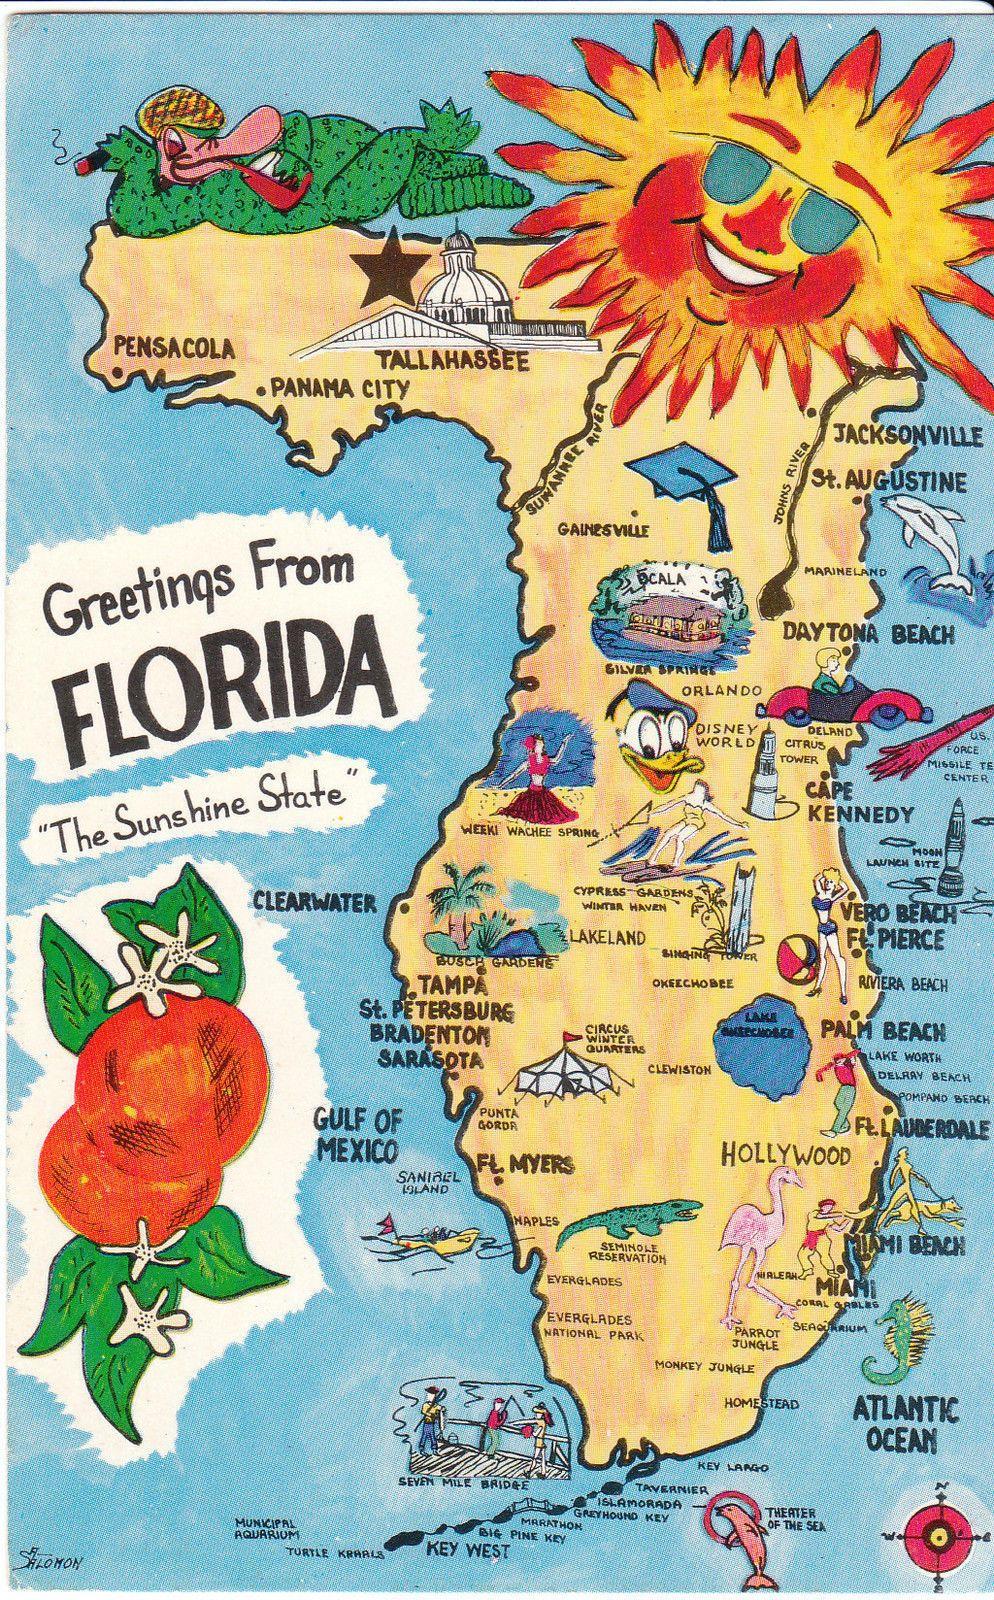 Vintage Florida Map Vintage Maps Pinterest - Florida map madeira beach